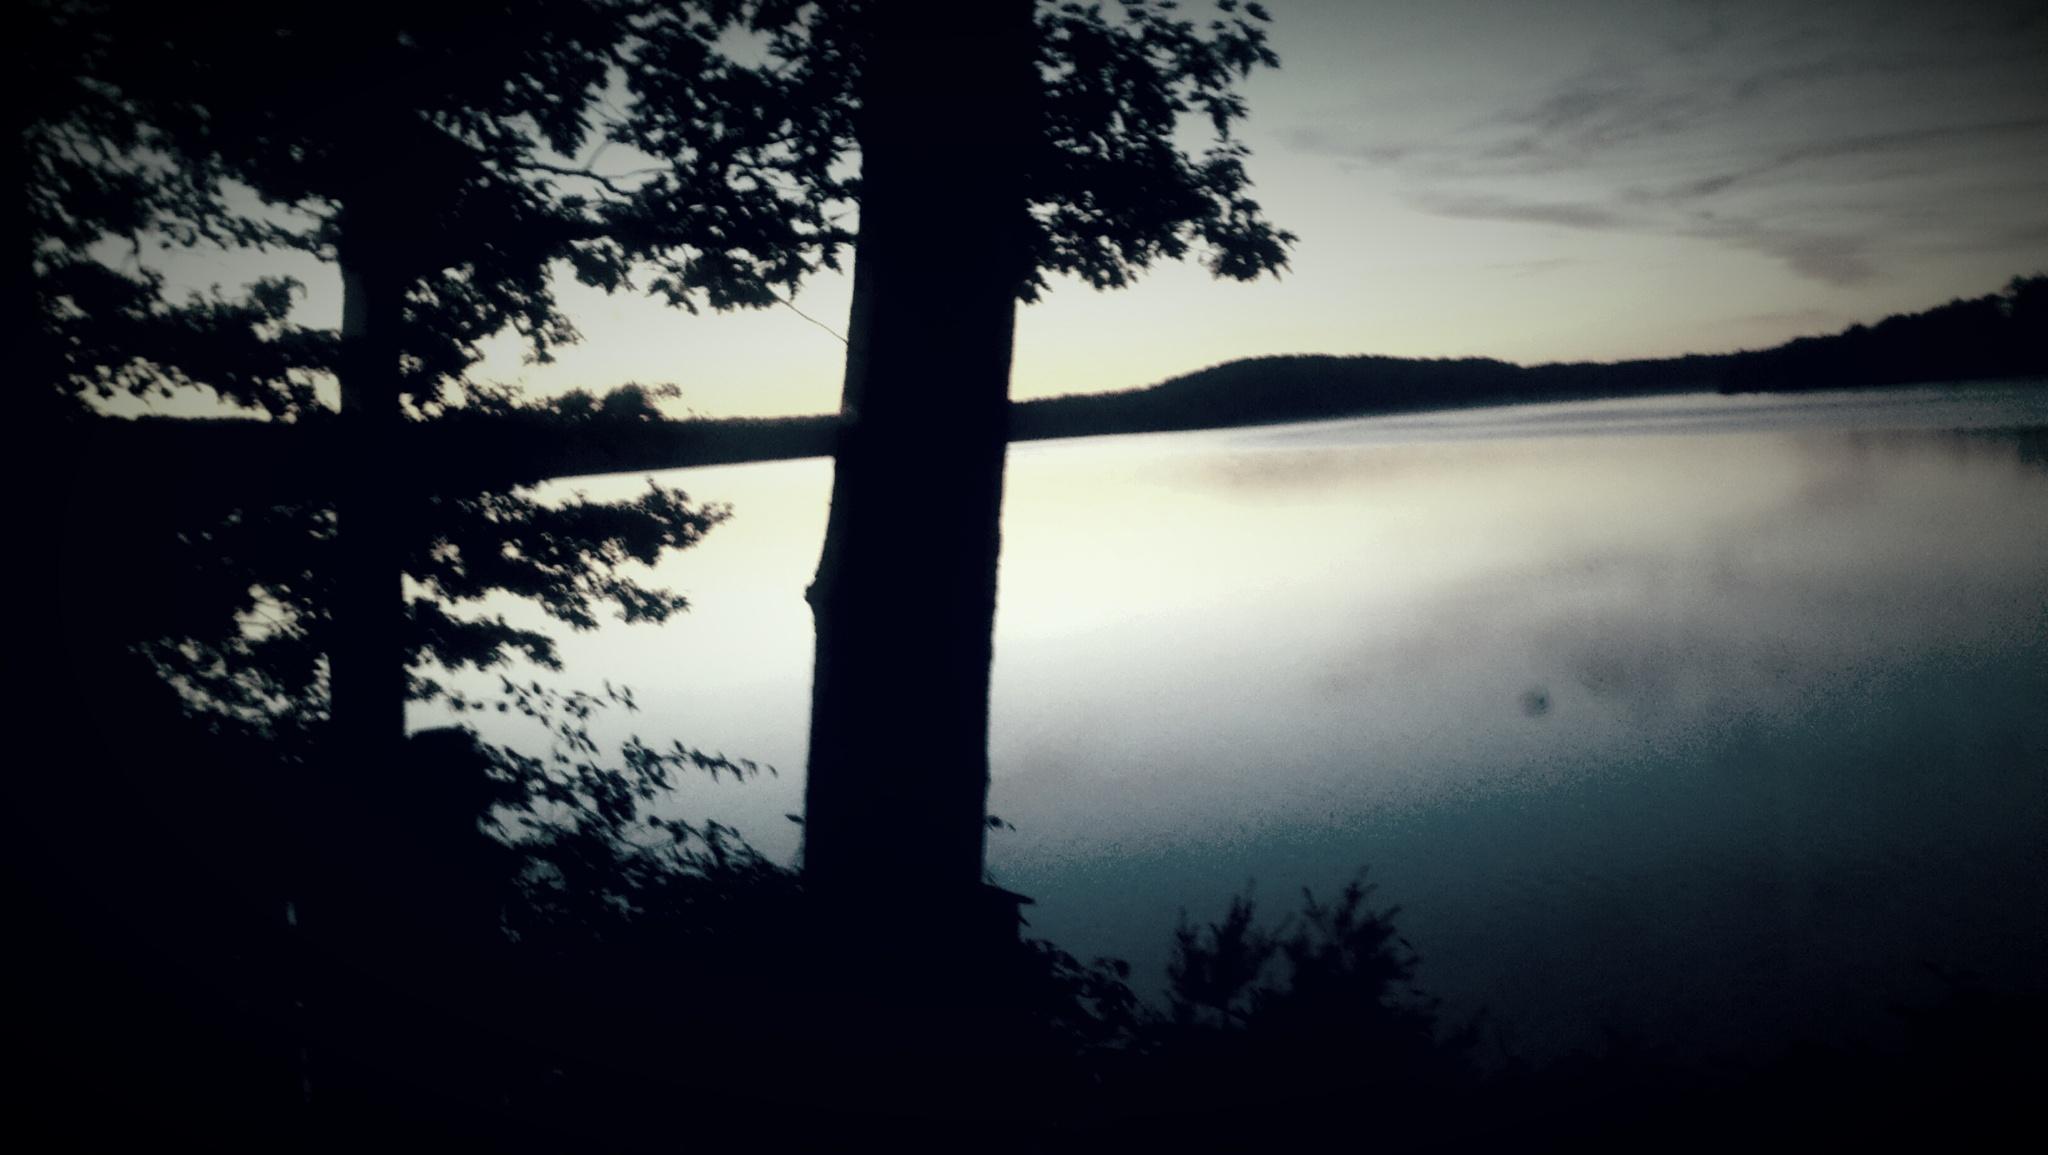 all is calm by Kathsdecor